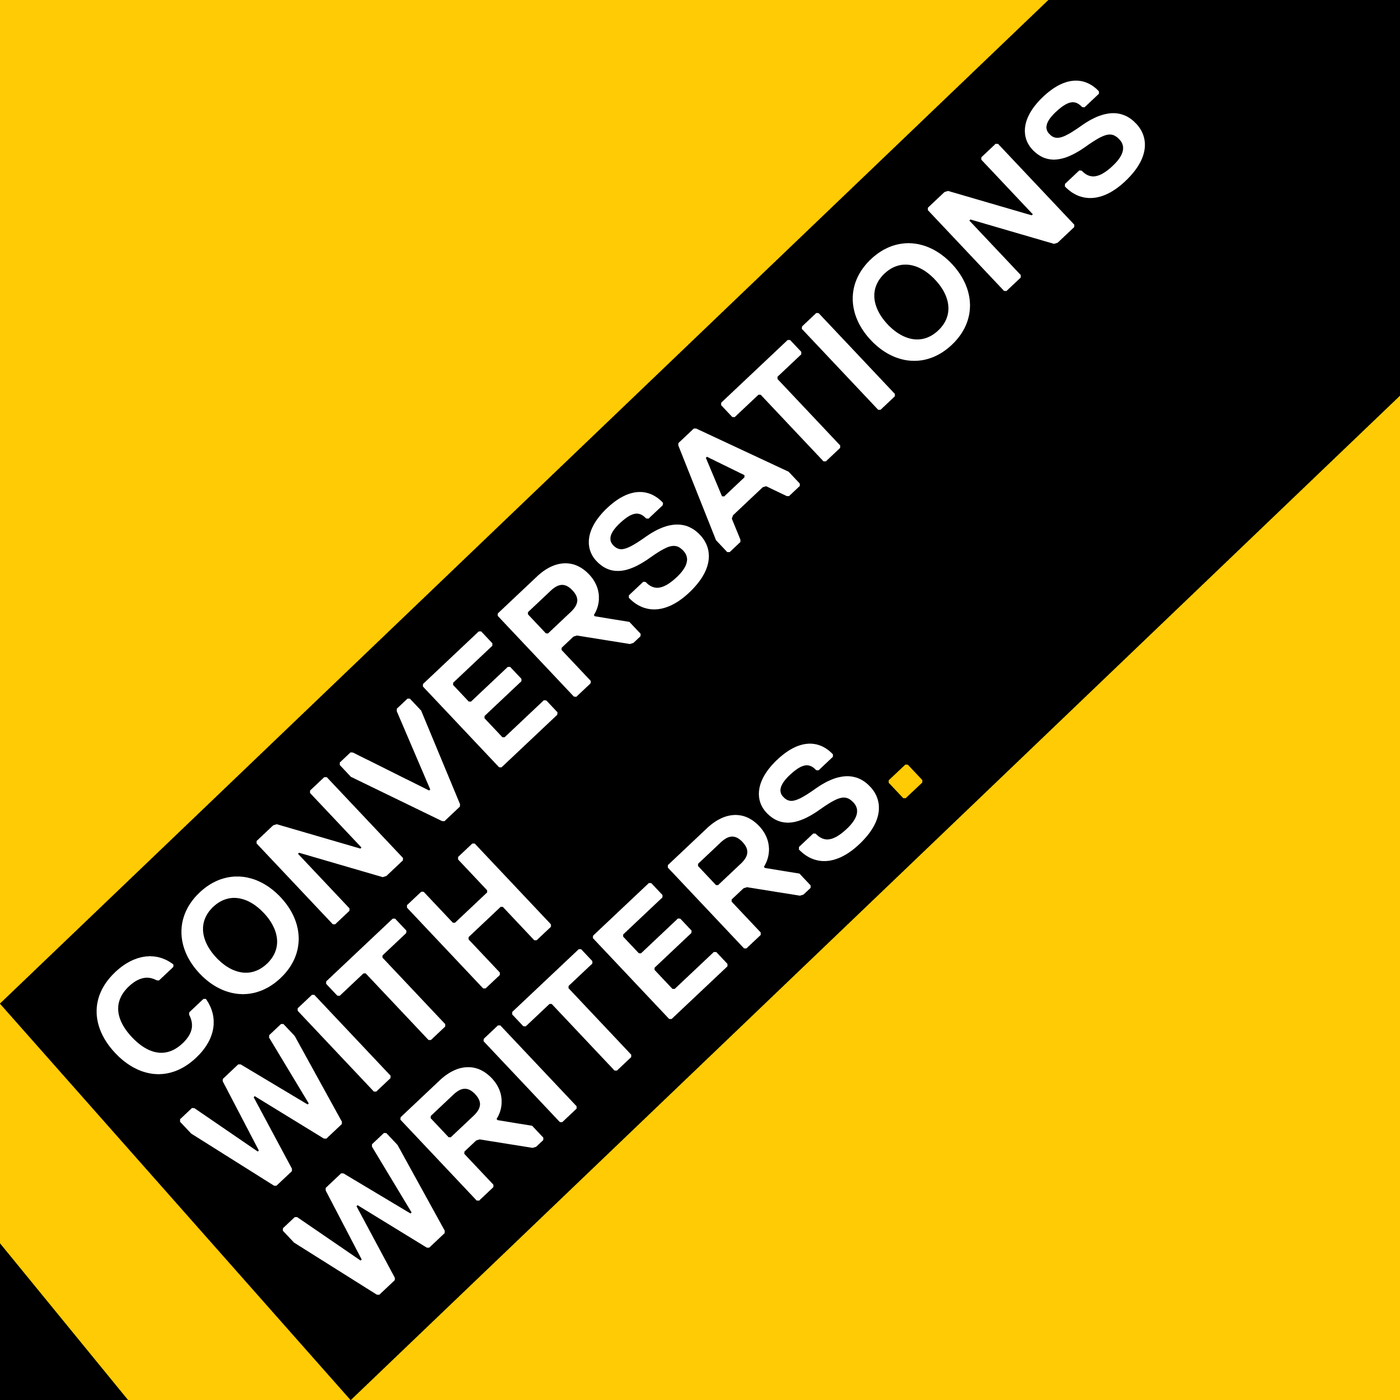 Chris Hammer - Scrublands secrets & violent anniversaries